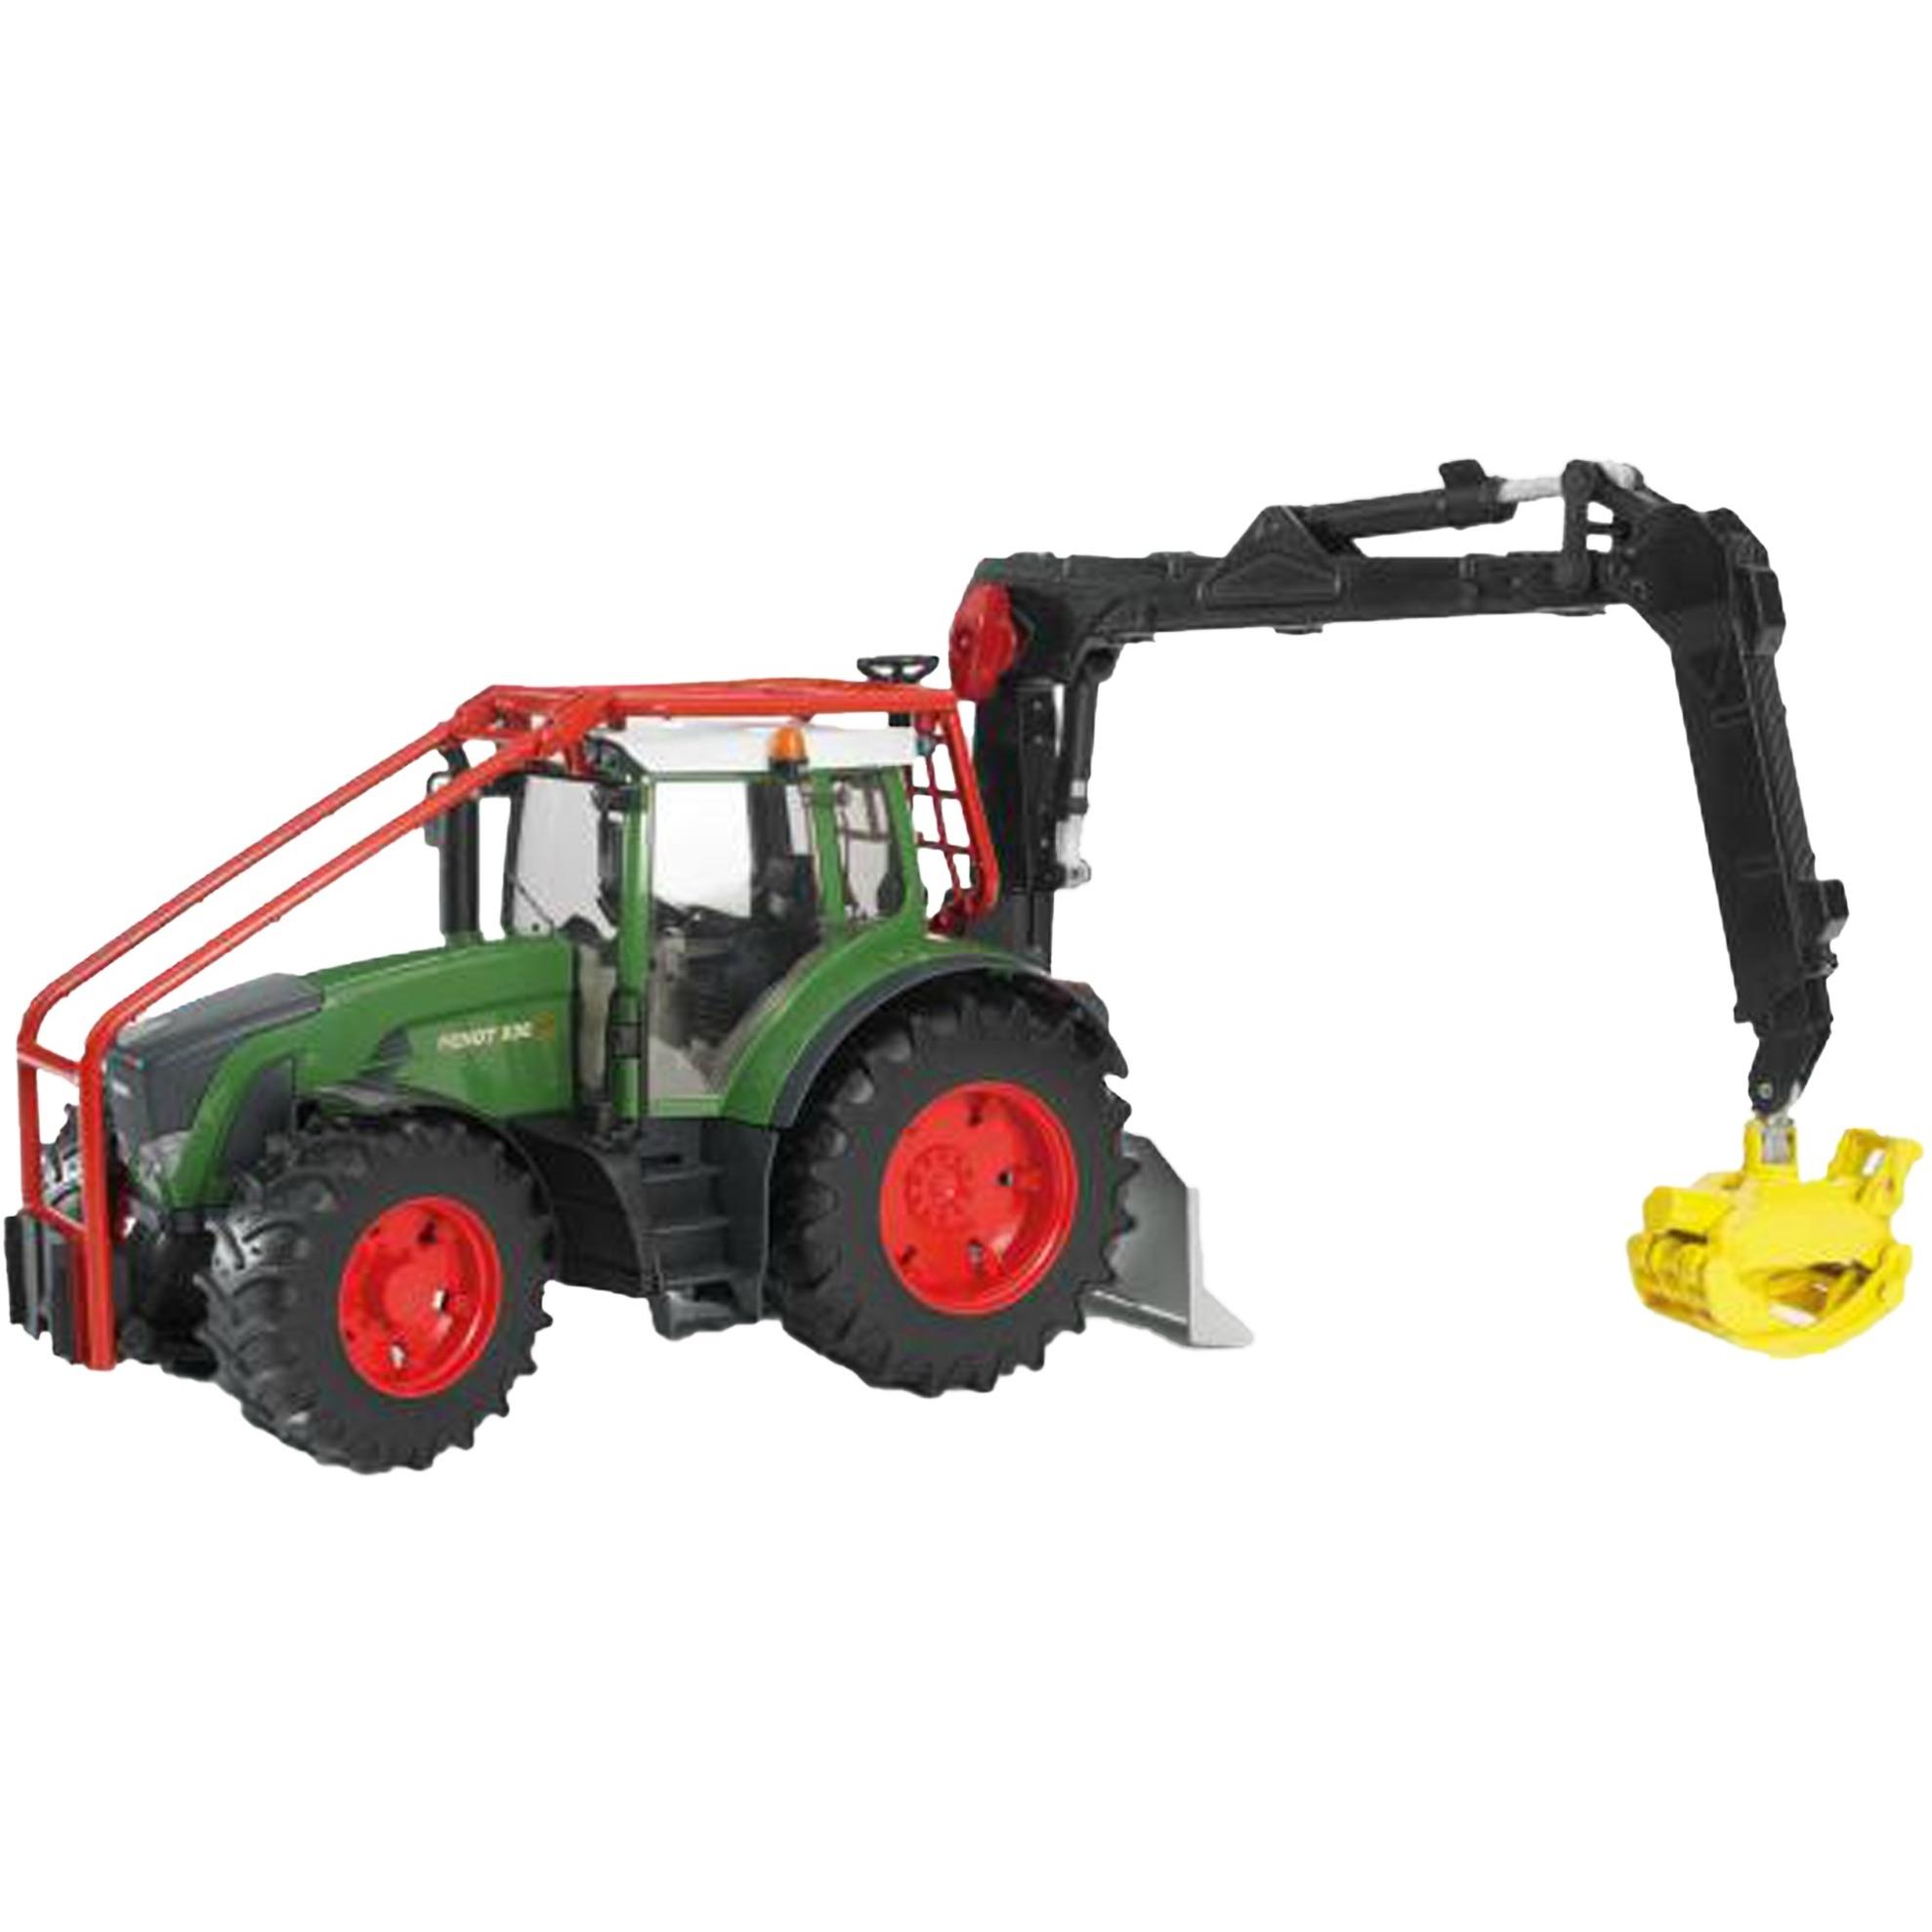 03042 Previamente montado Modelo a escala de tractor 1:16 modelo de vehículo de tierra, Automóvil de construcción